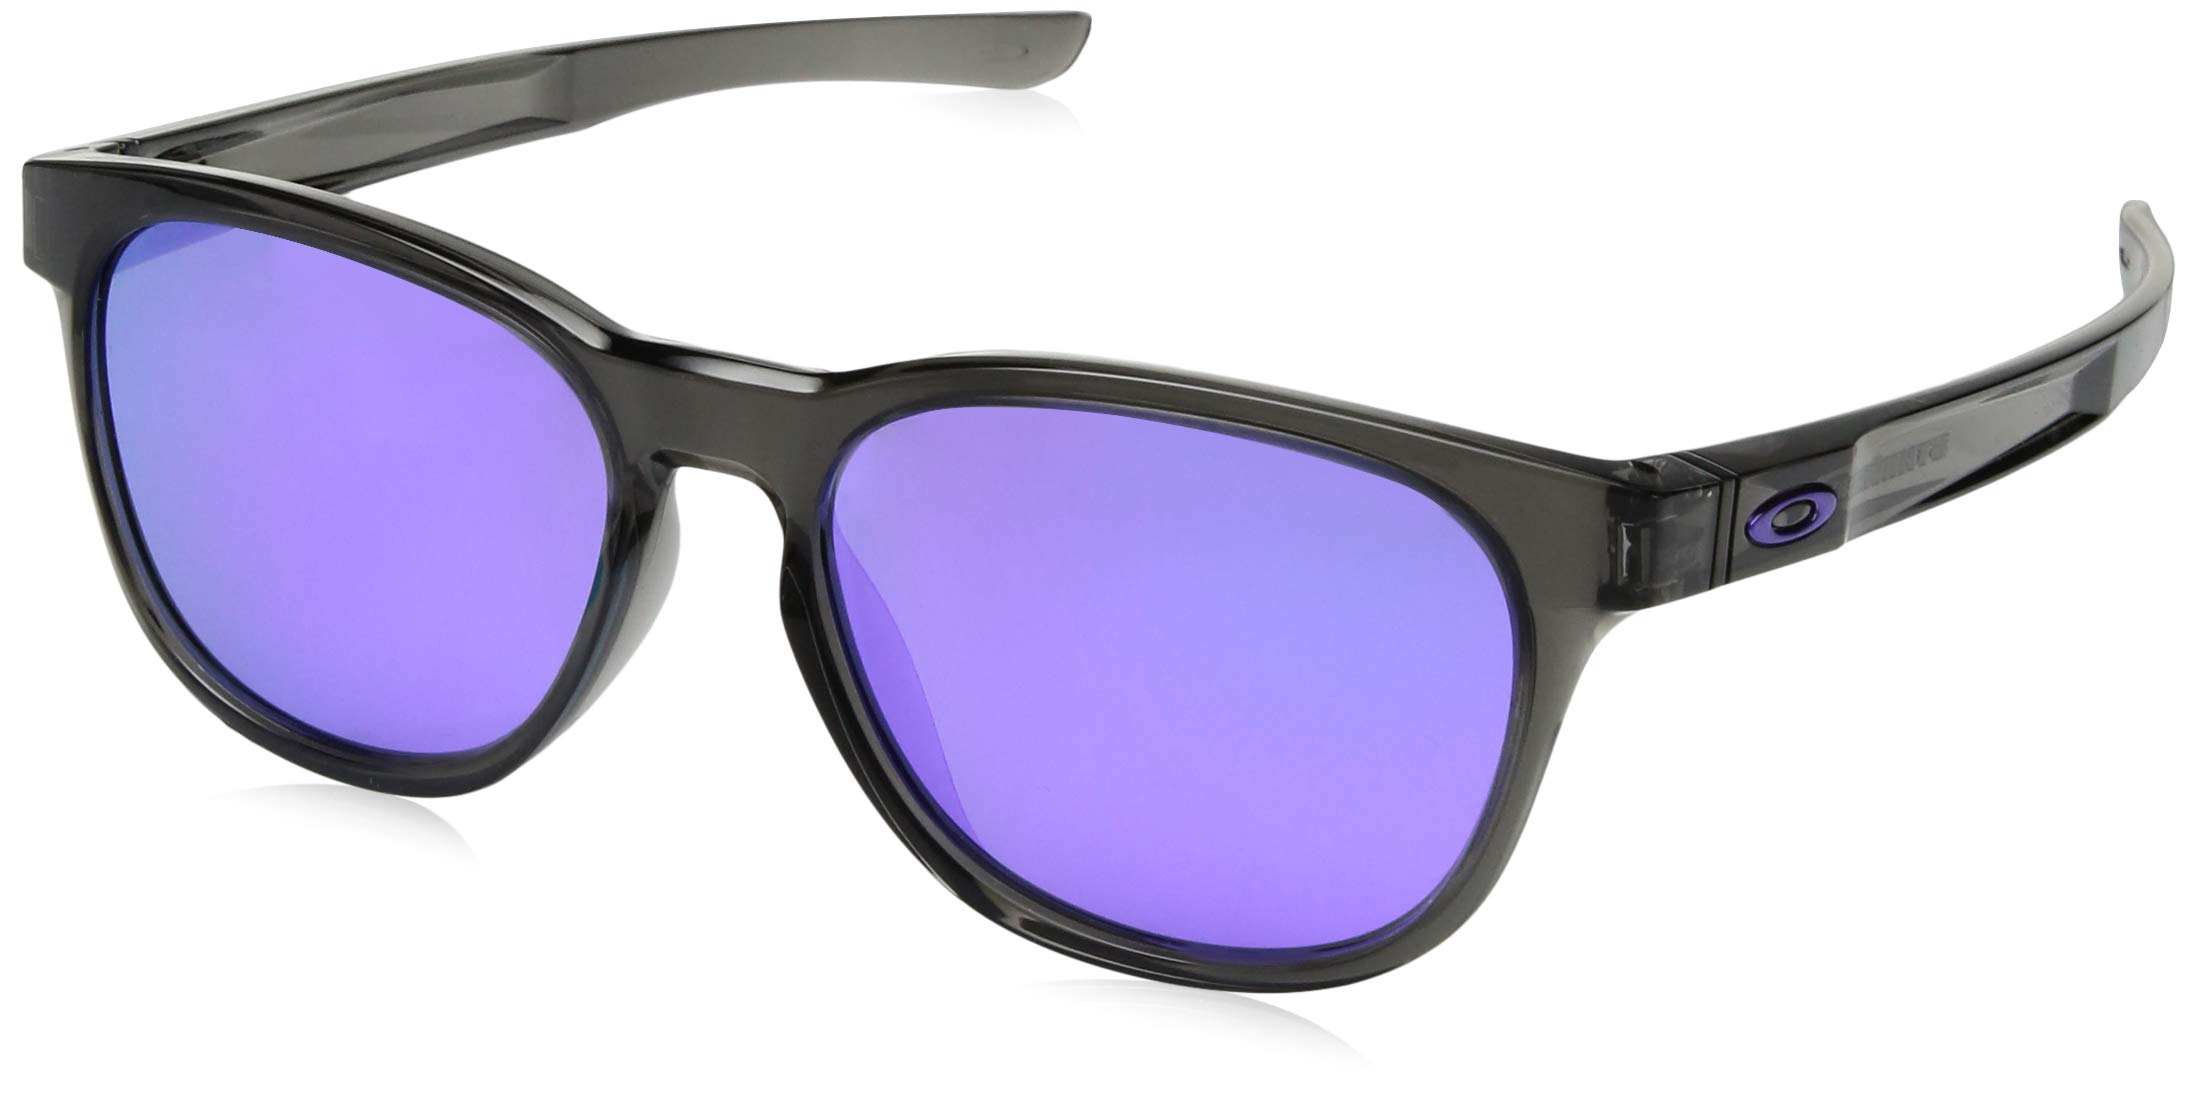 Oakley Stringer Sunglasses Grey Smoke/Violet